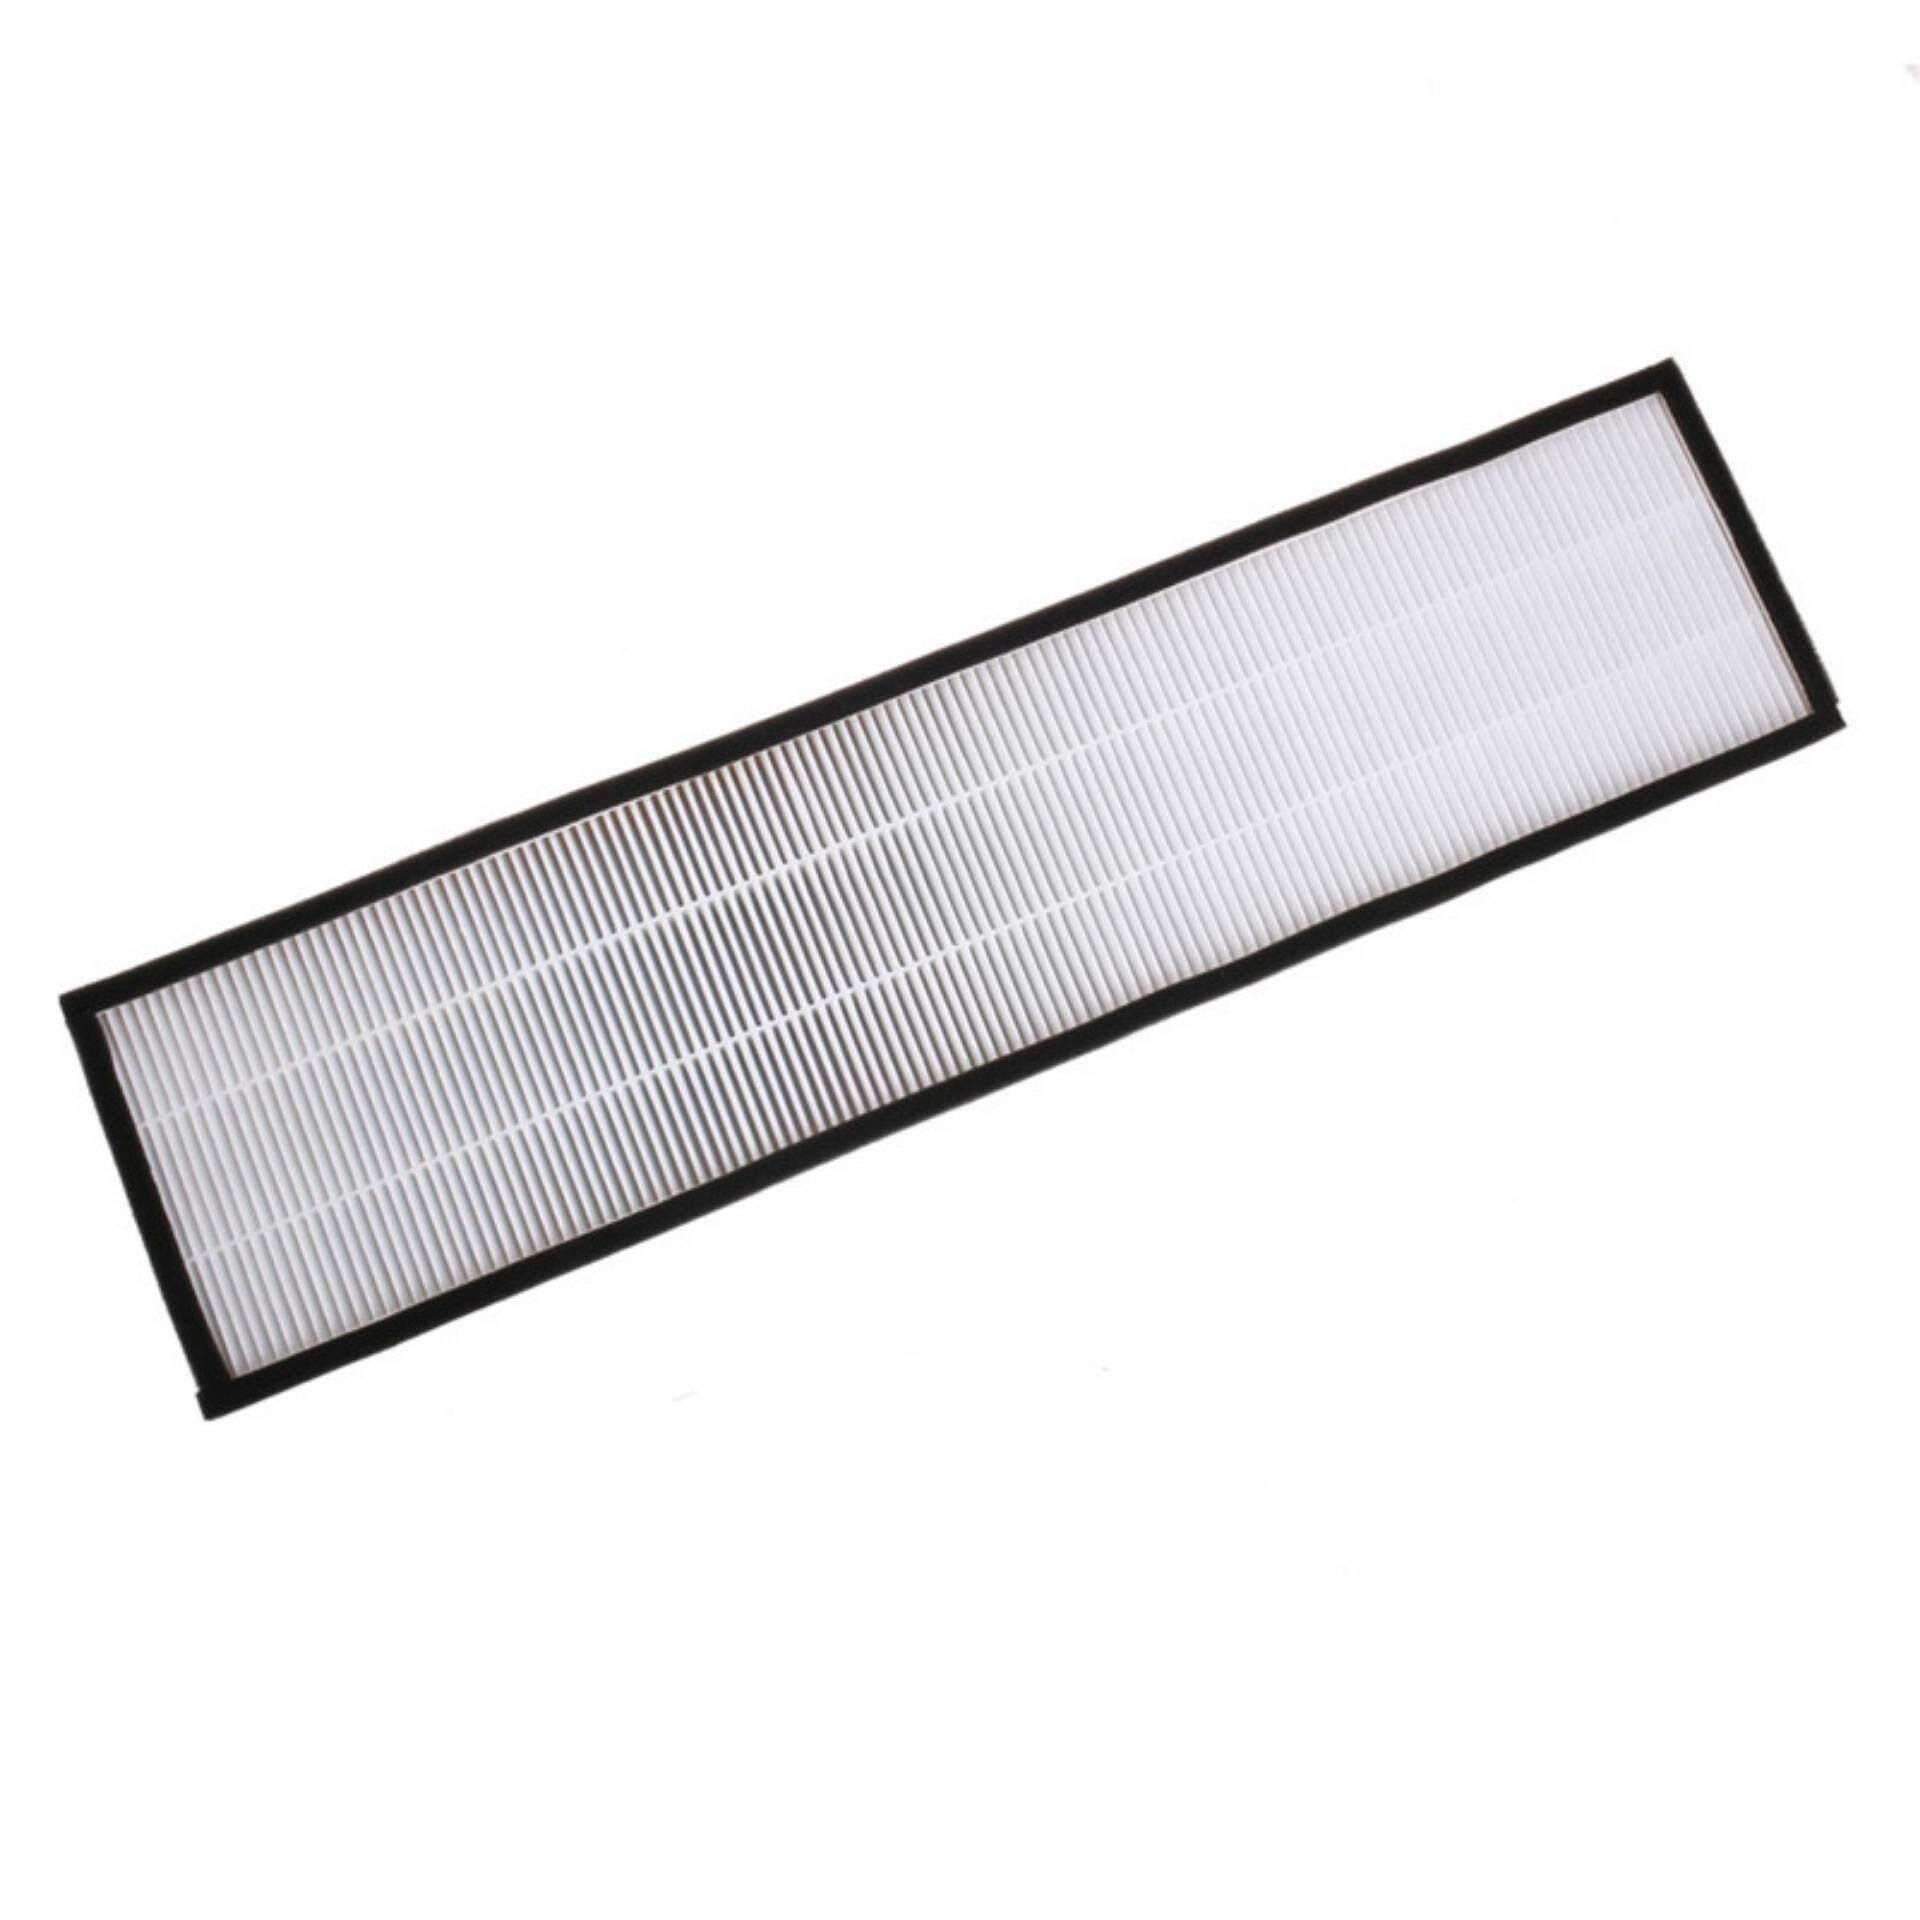 Hình ảnh Air Purifier HEPA C Filters For GermGuardian AC5000 Series FLT5000 FLT5111 - intl